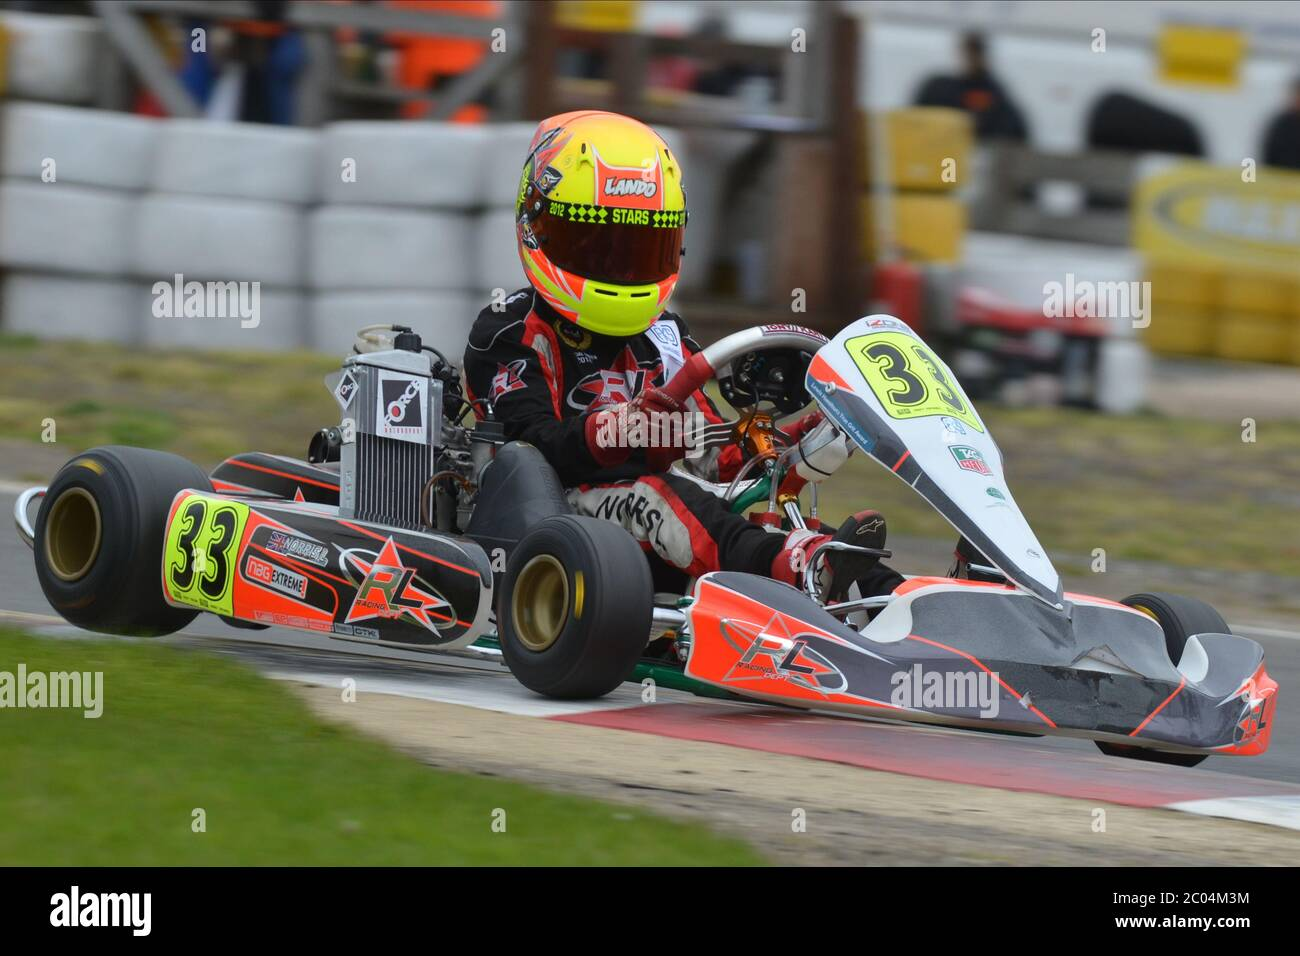 Lando Norris's karting career 2012. Stock Photo